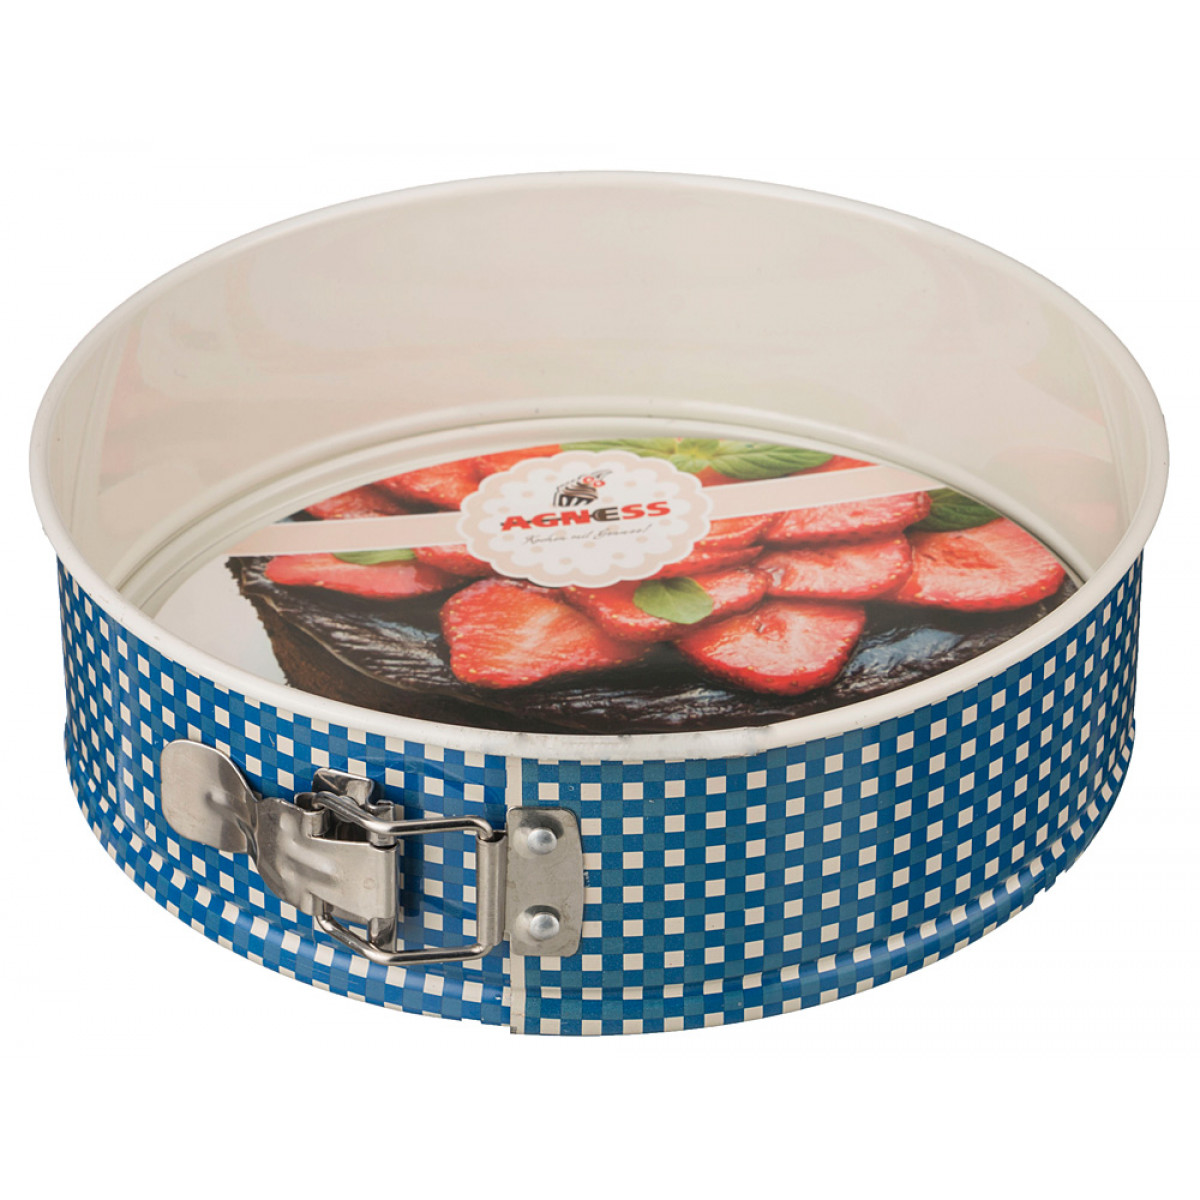 все цены на  {} Agness Форма для выпечки Draven  (7х22 см)  онлайн